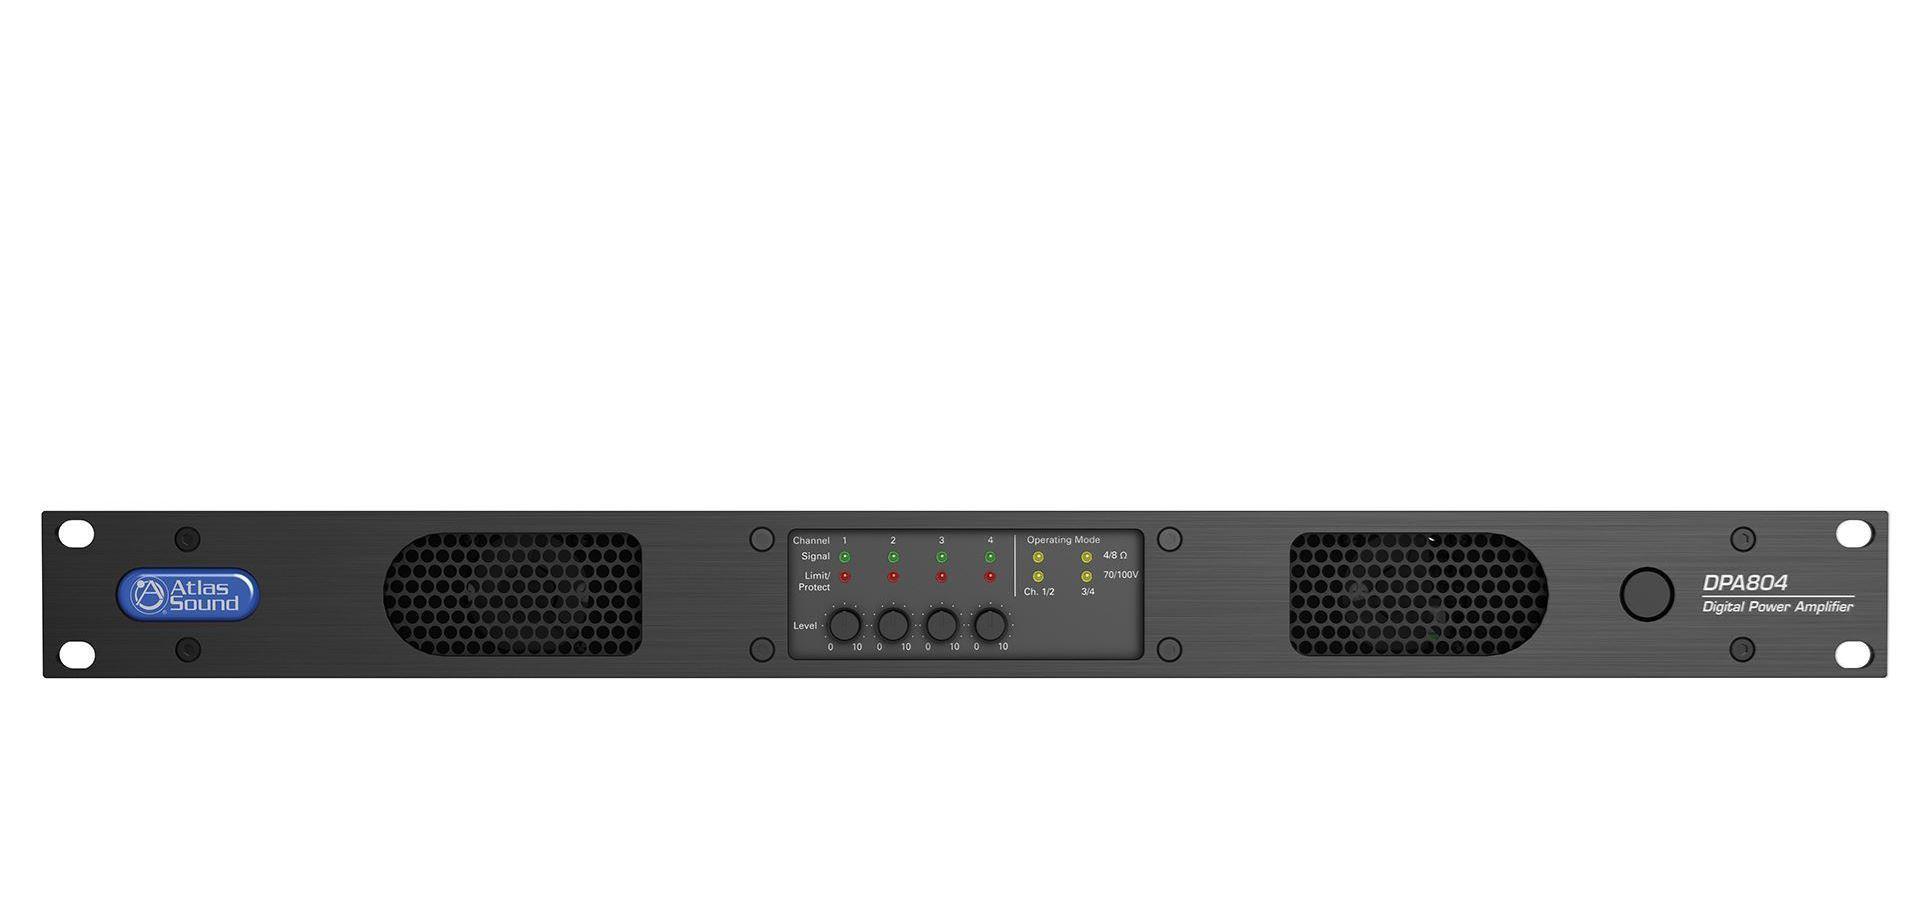 atl DPA804 ATLAS AMP DSP 4X200W@70.7/100V 1RU